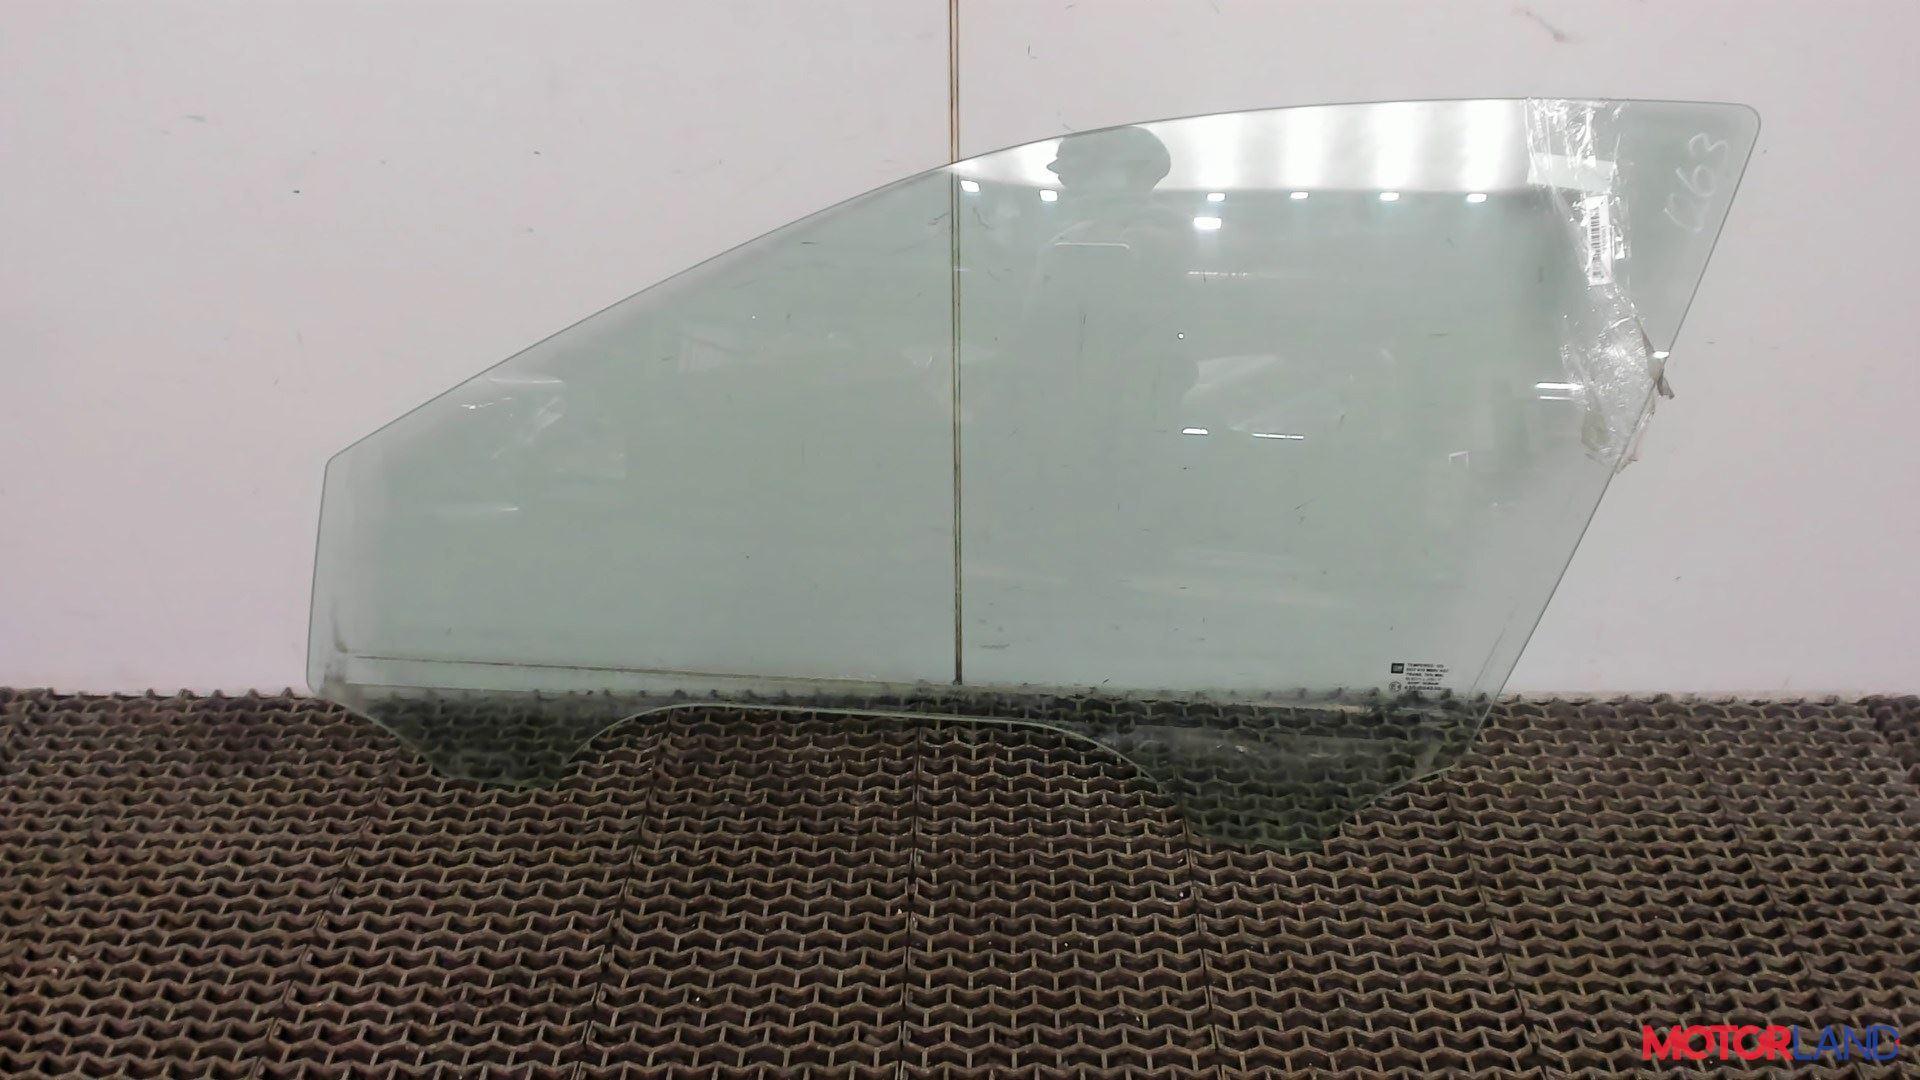 Стекло боковой двери [AdditionalType] Cadillac CTS 2002-2007, [КонстрНомер-Артикул] #1